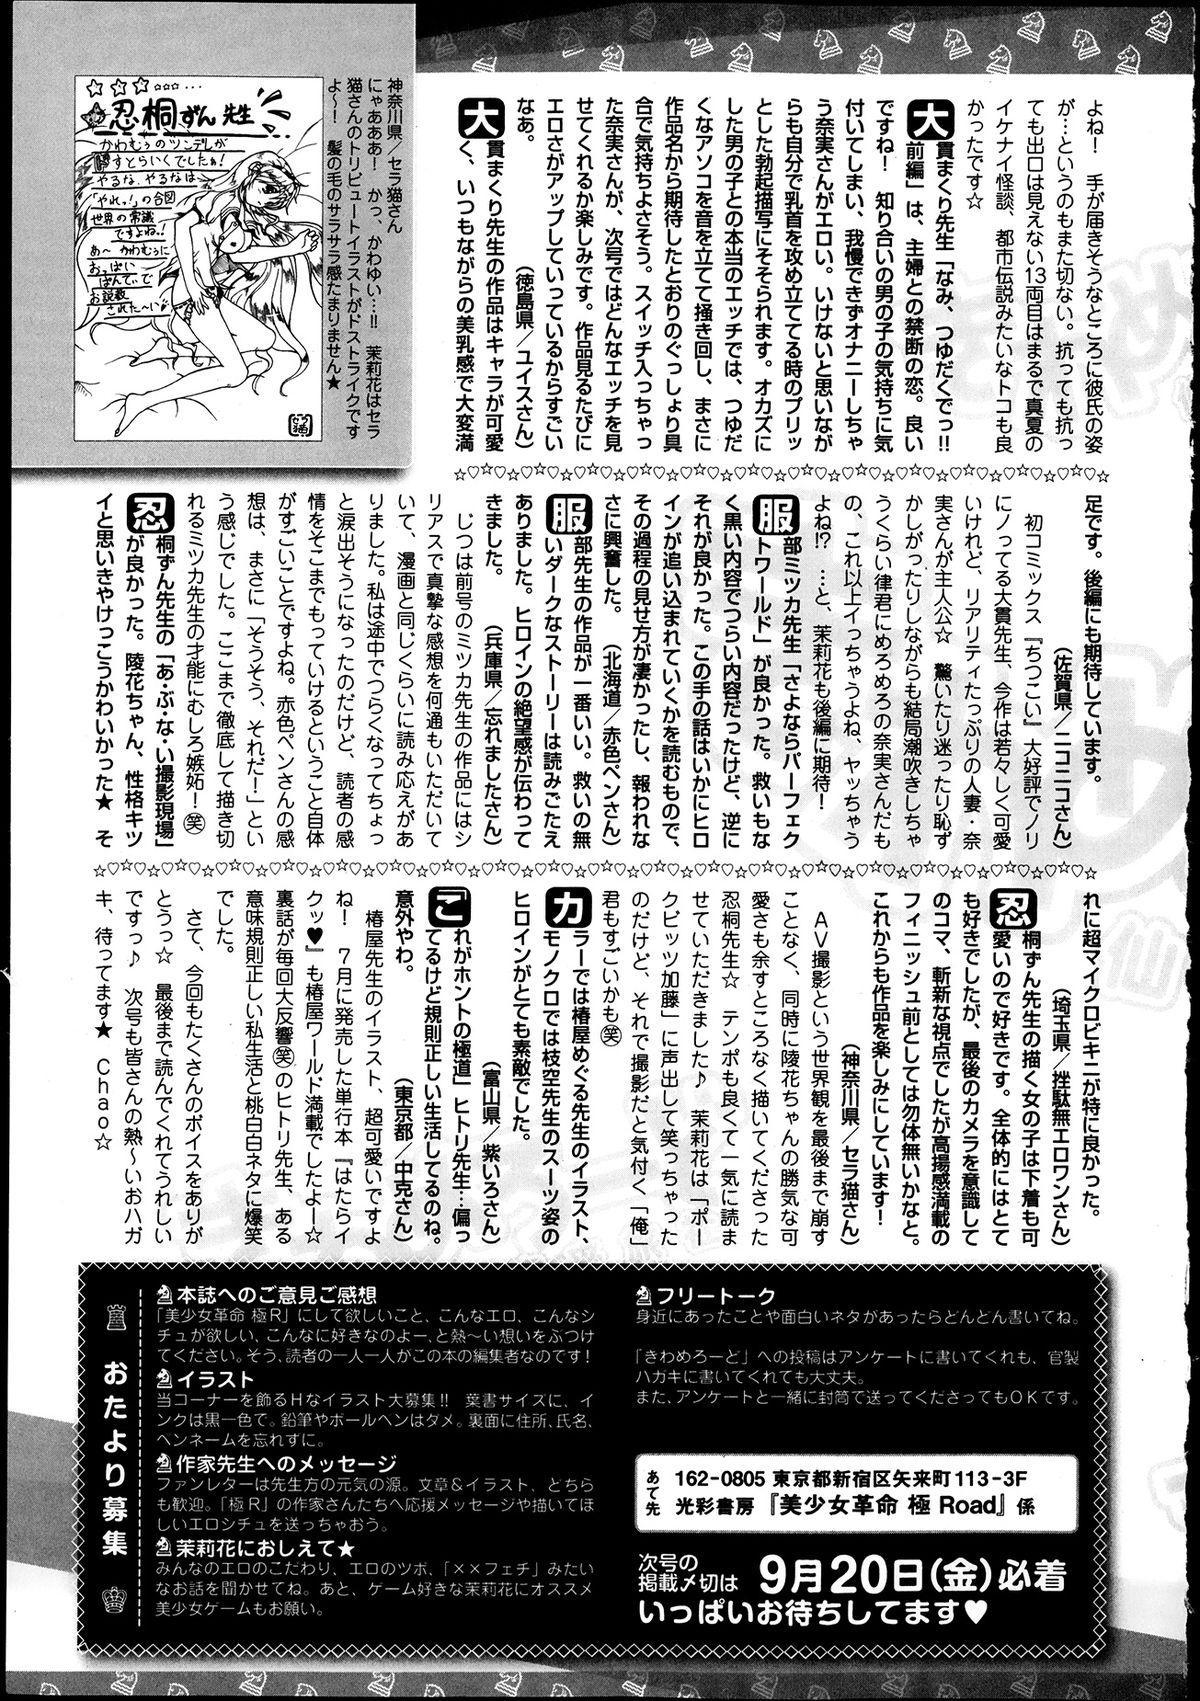 Bishoujo Kakumei KIWAME Road Vol.9 262